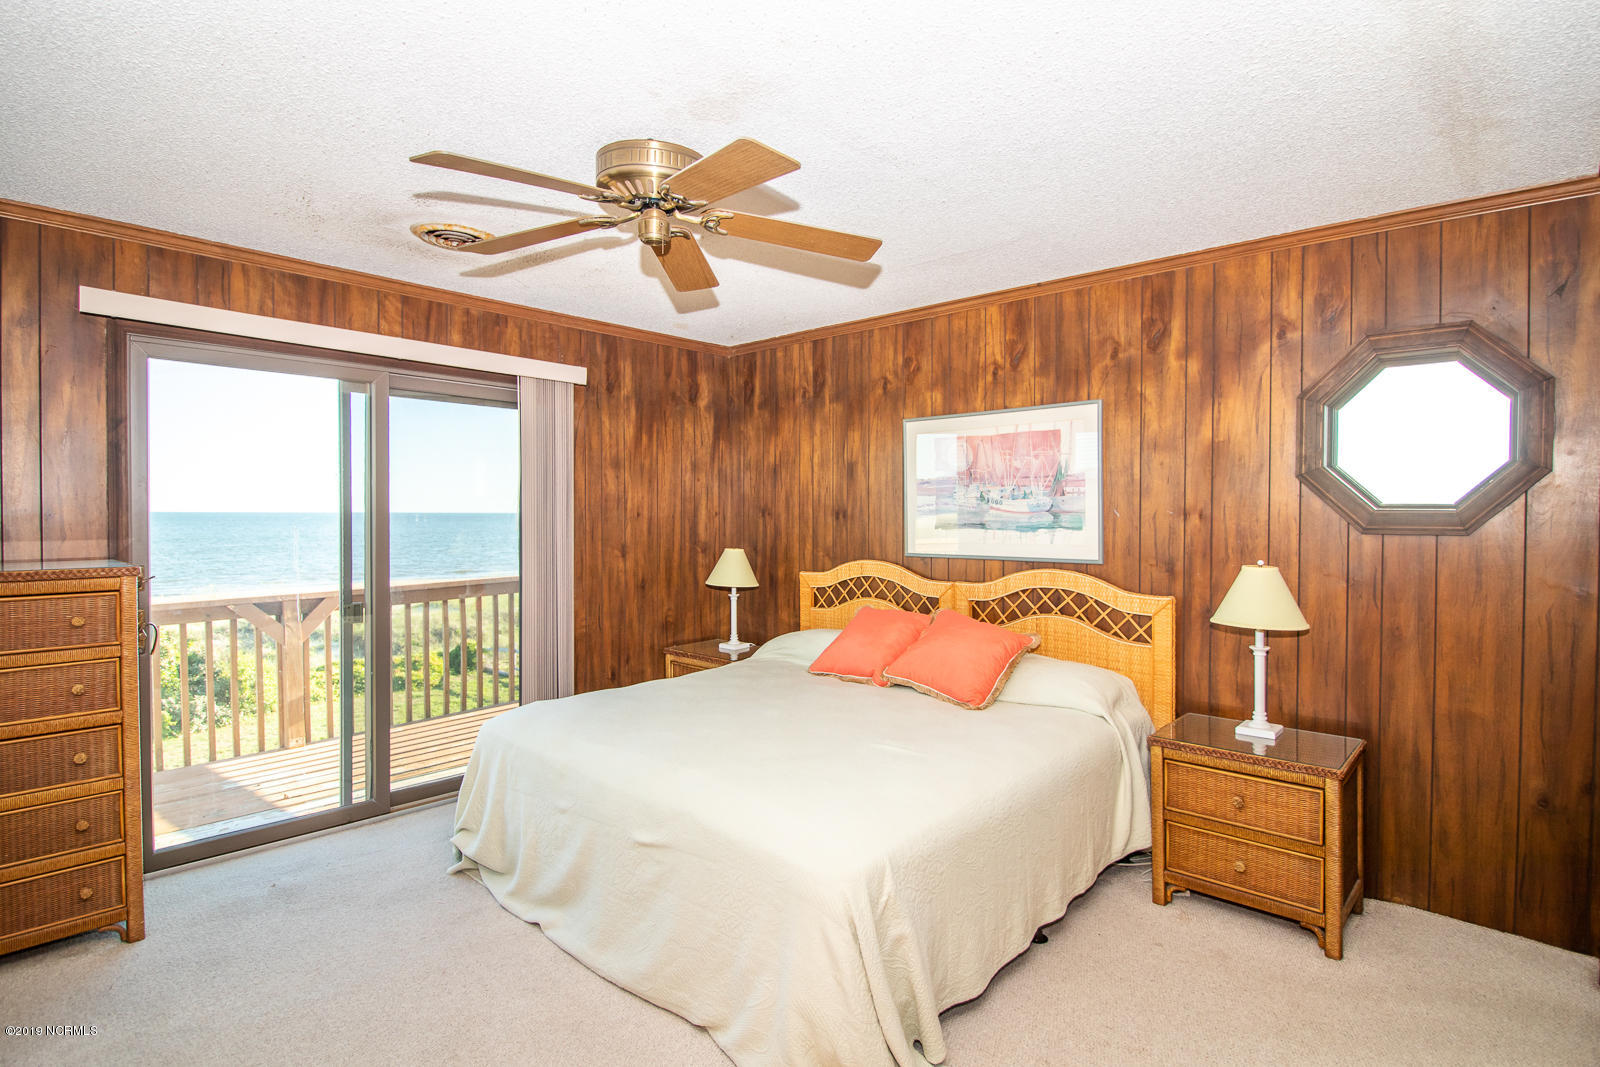 215 Caswell Beach Road Caswell Beach, NC 28465